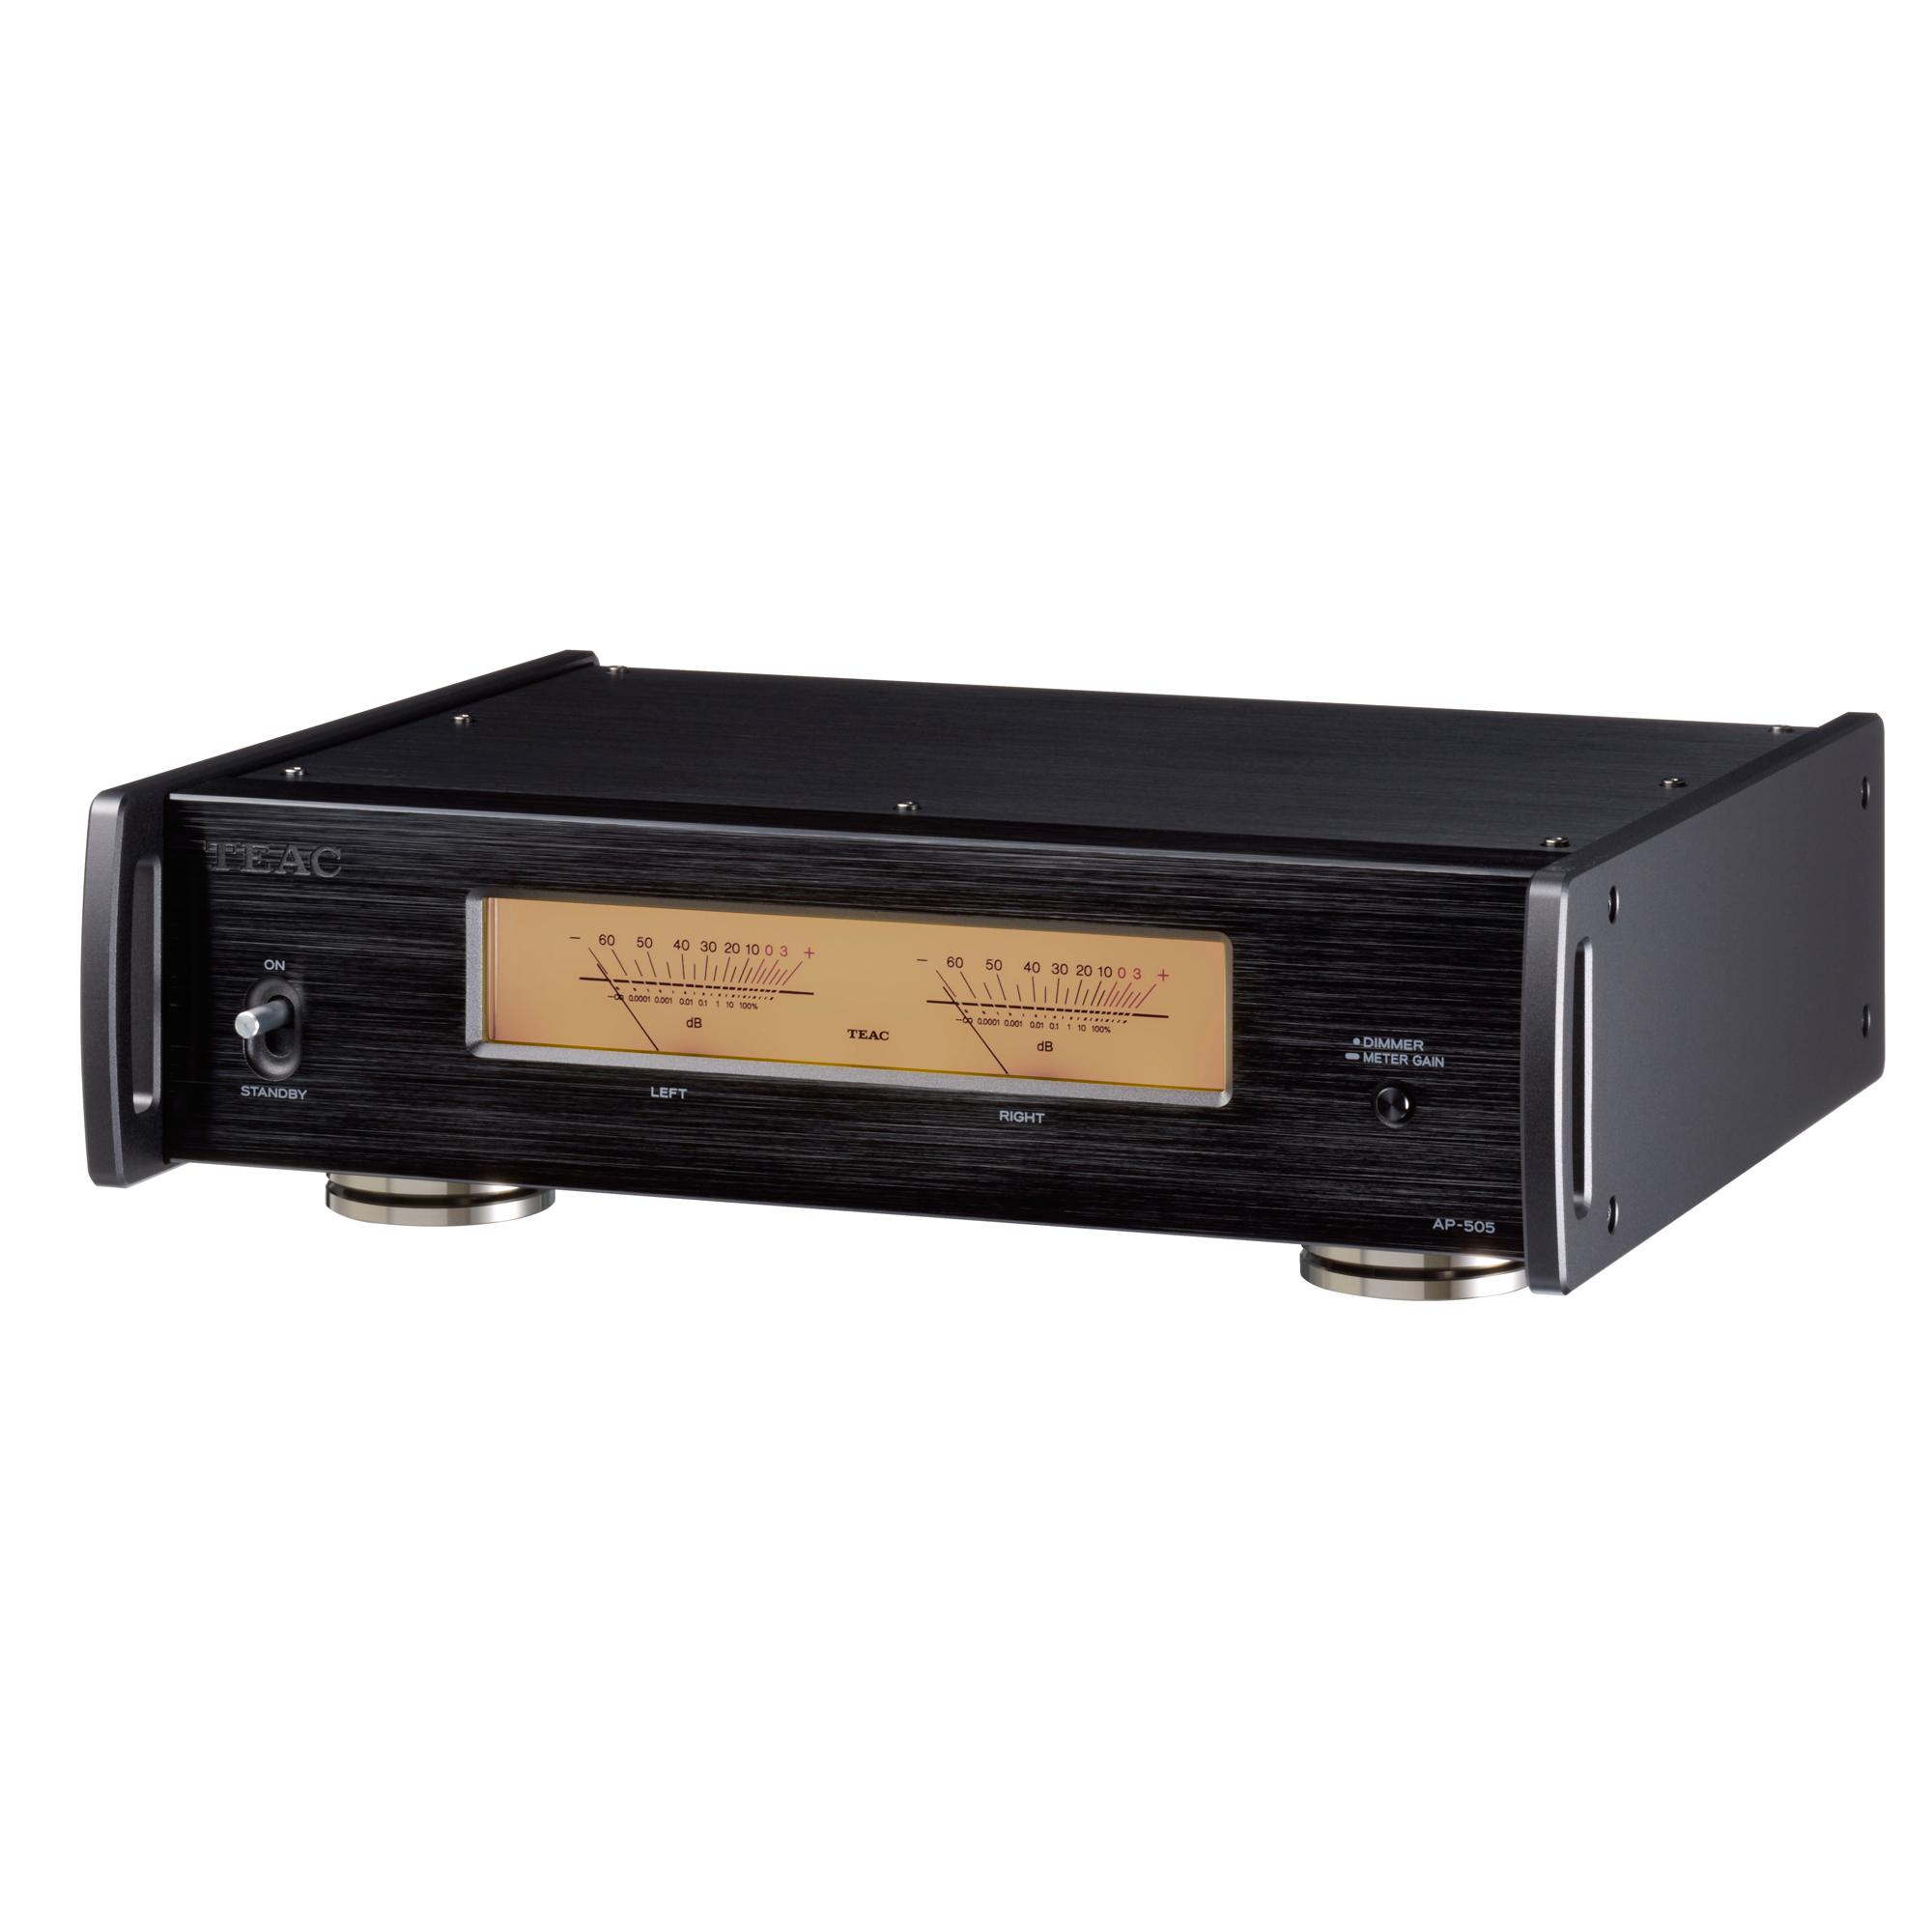 Teac AP-505 schwarz Stereo-Endverstärker 101132